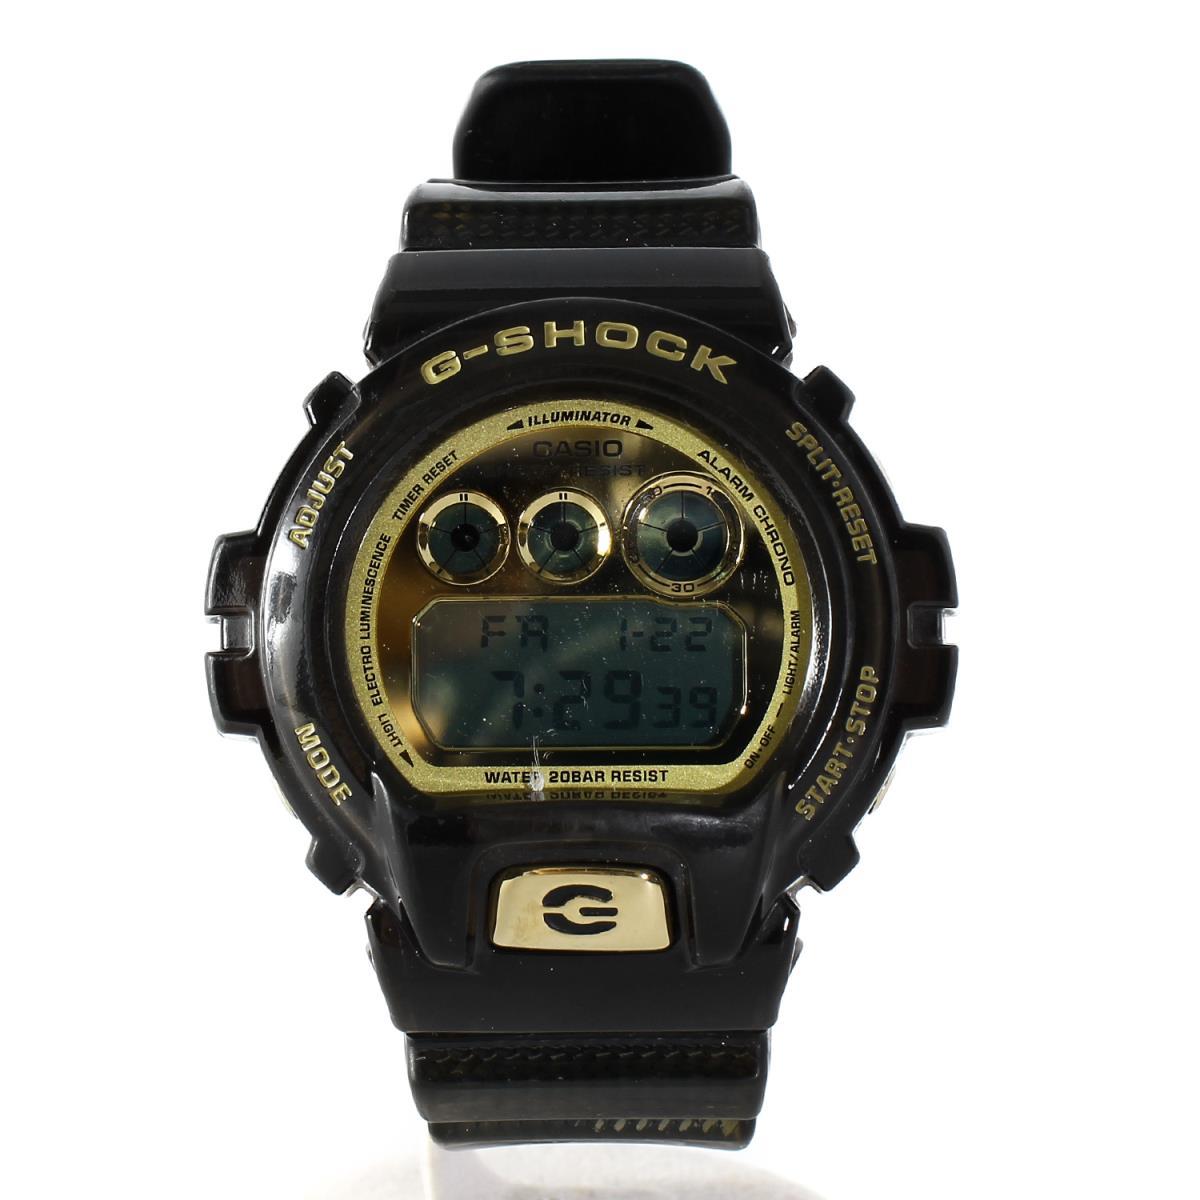 G-SHOCK (ジーショック) 30周年記念 DW-6930D-1JR Thirty Stars 腕時計 / ウォッチ ブラック×ゴールド 【メンズ】【K2211】【中古】【あす楽☆対応可】